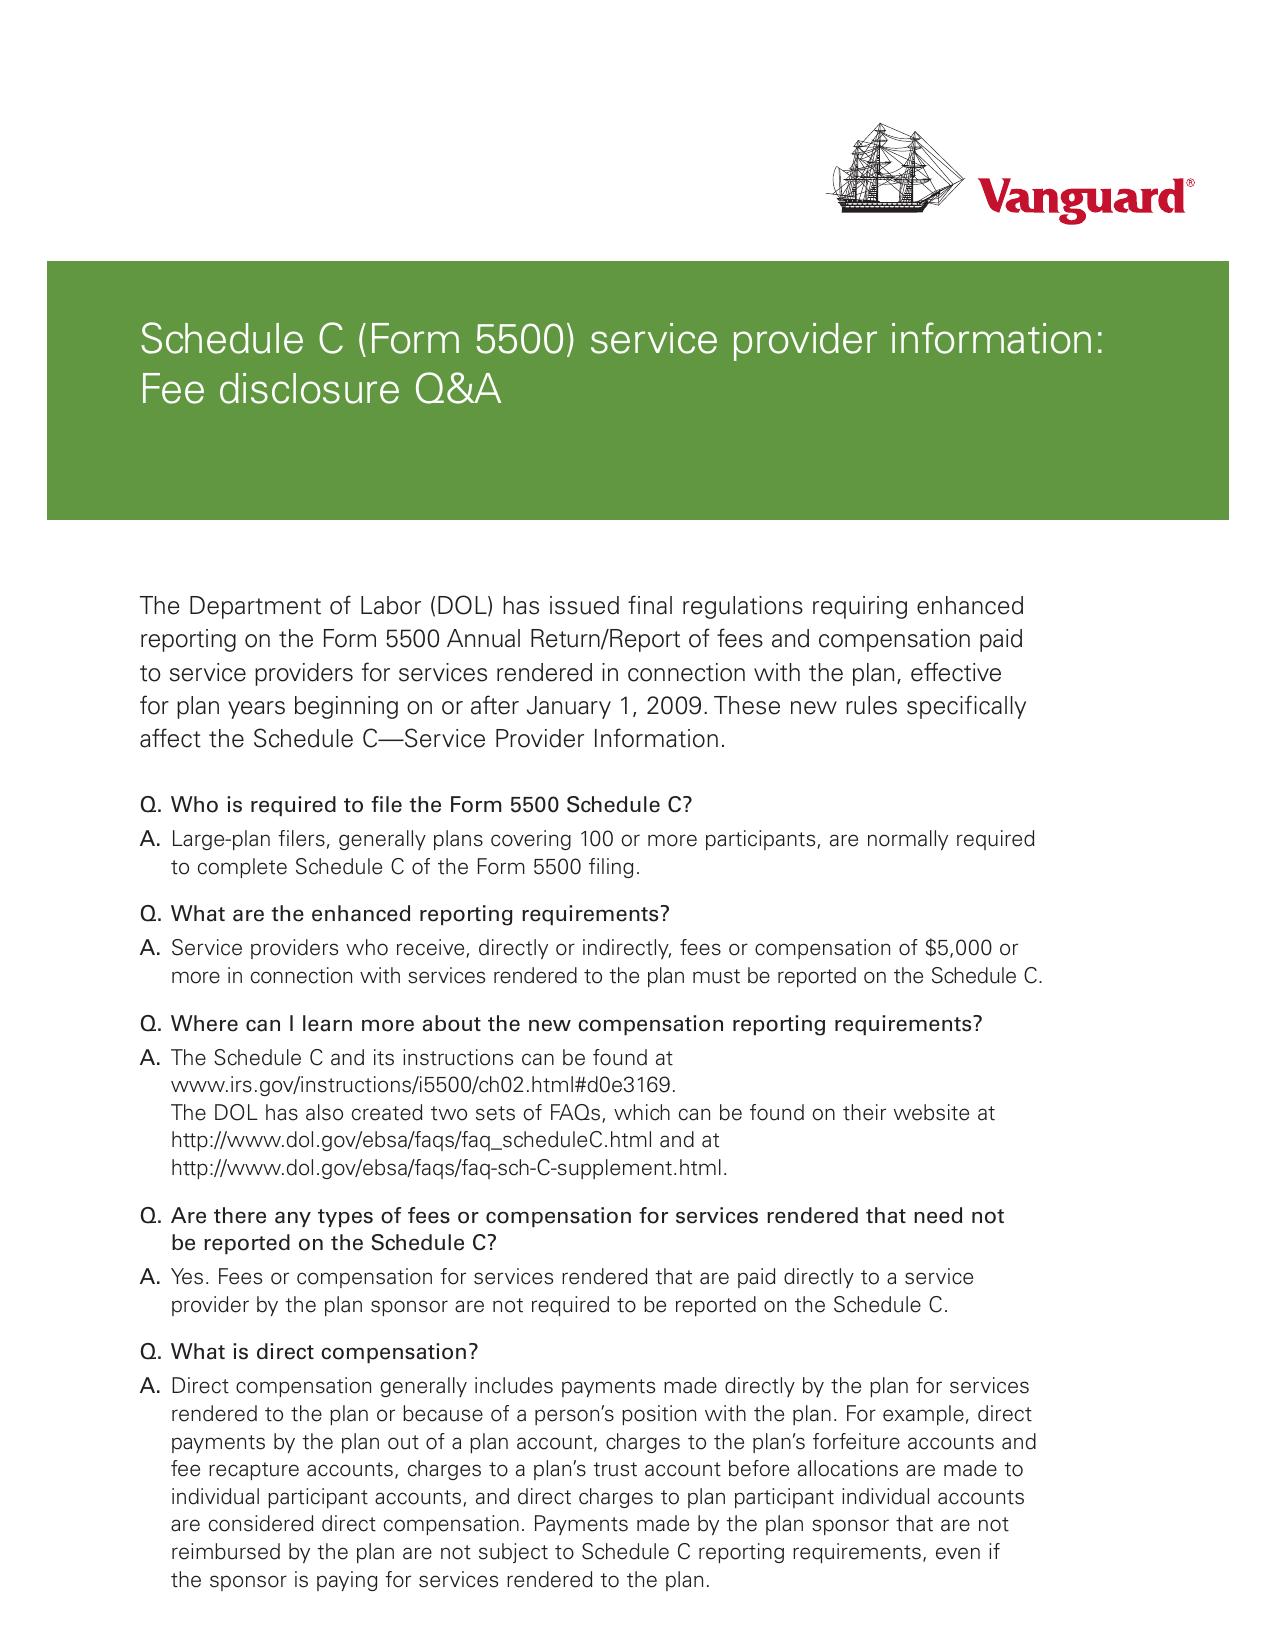 Schedule C Form 5500 Service Provider